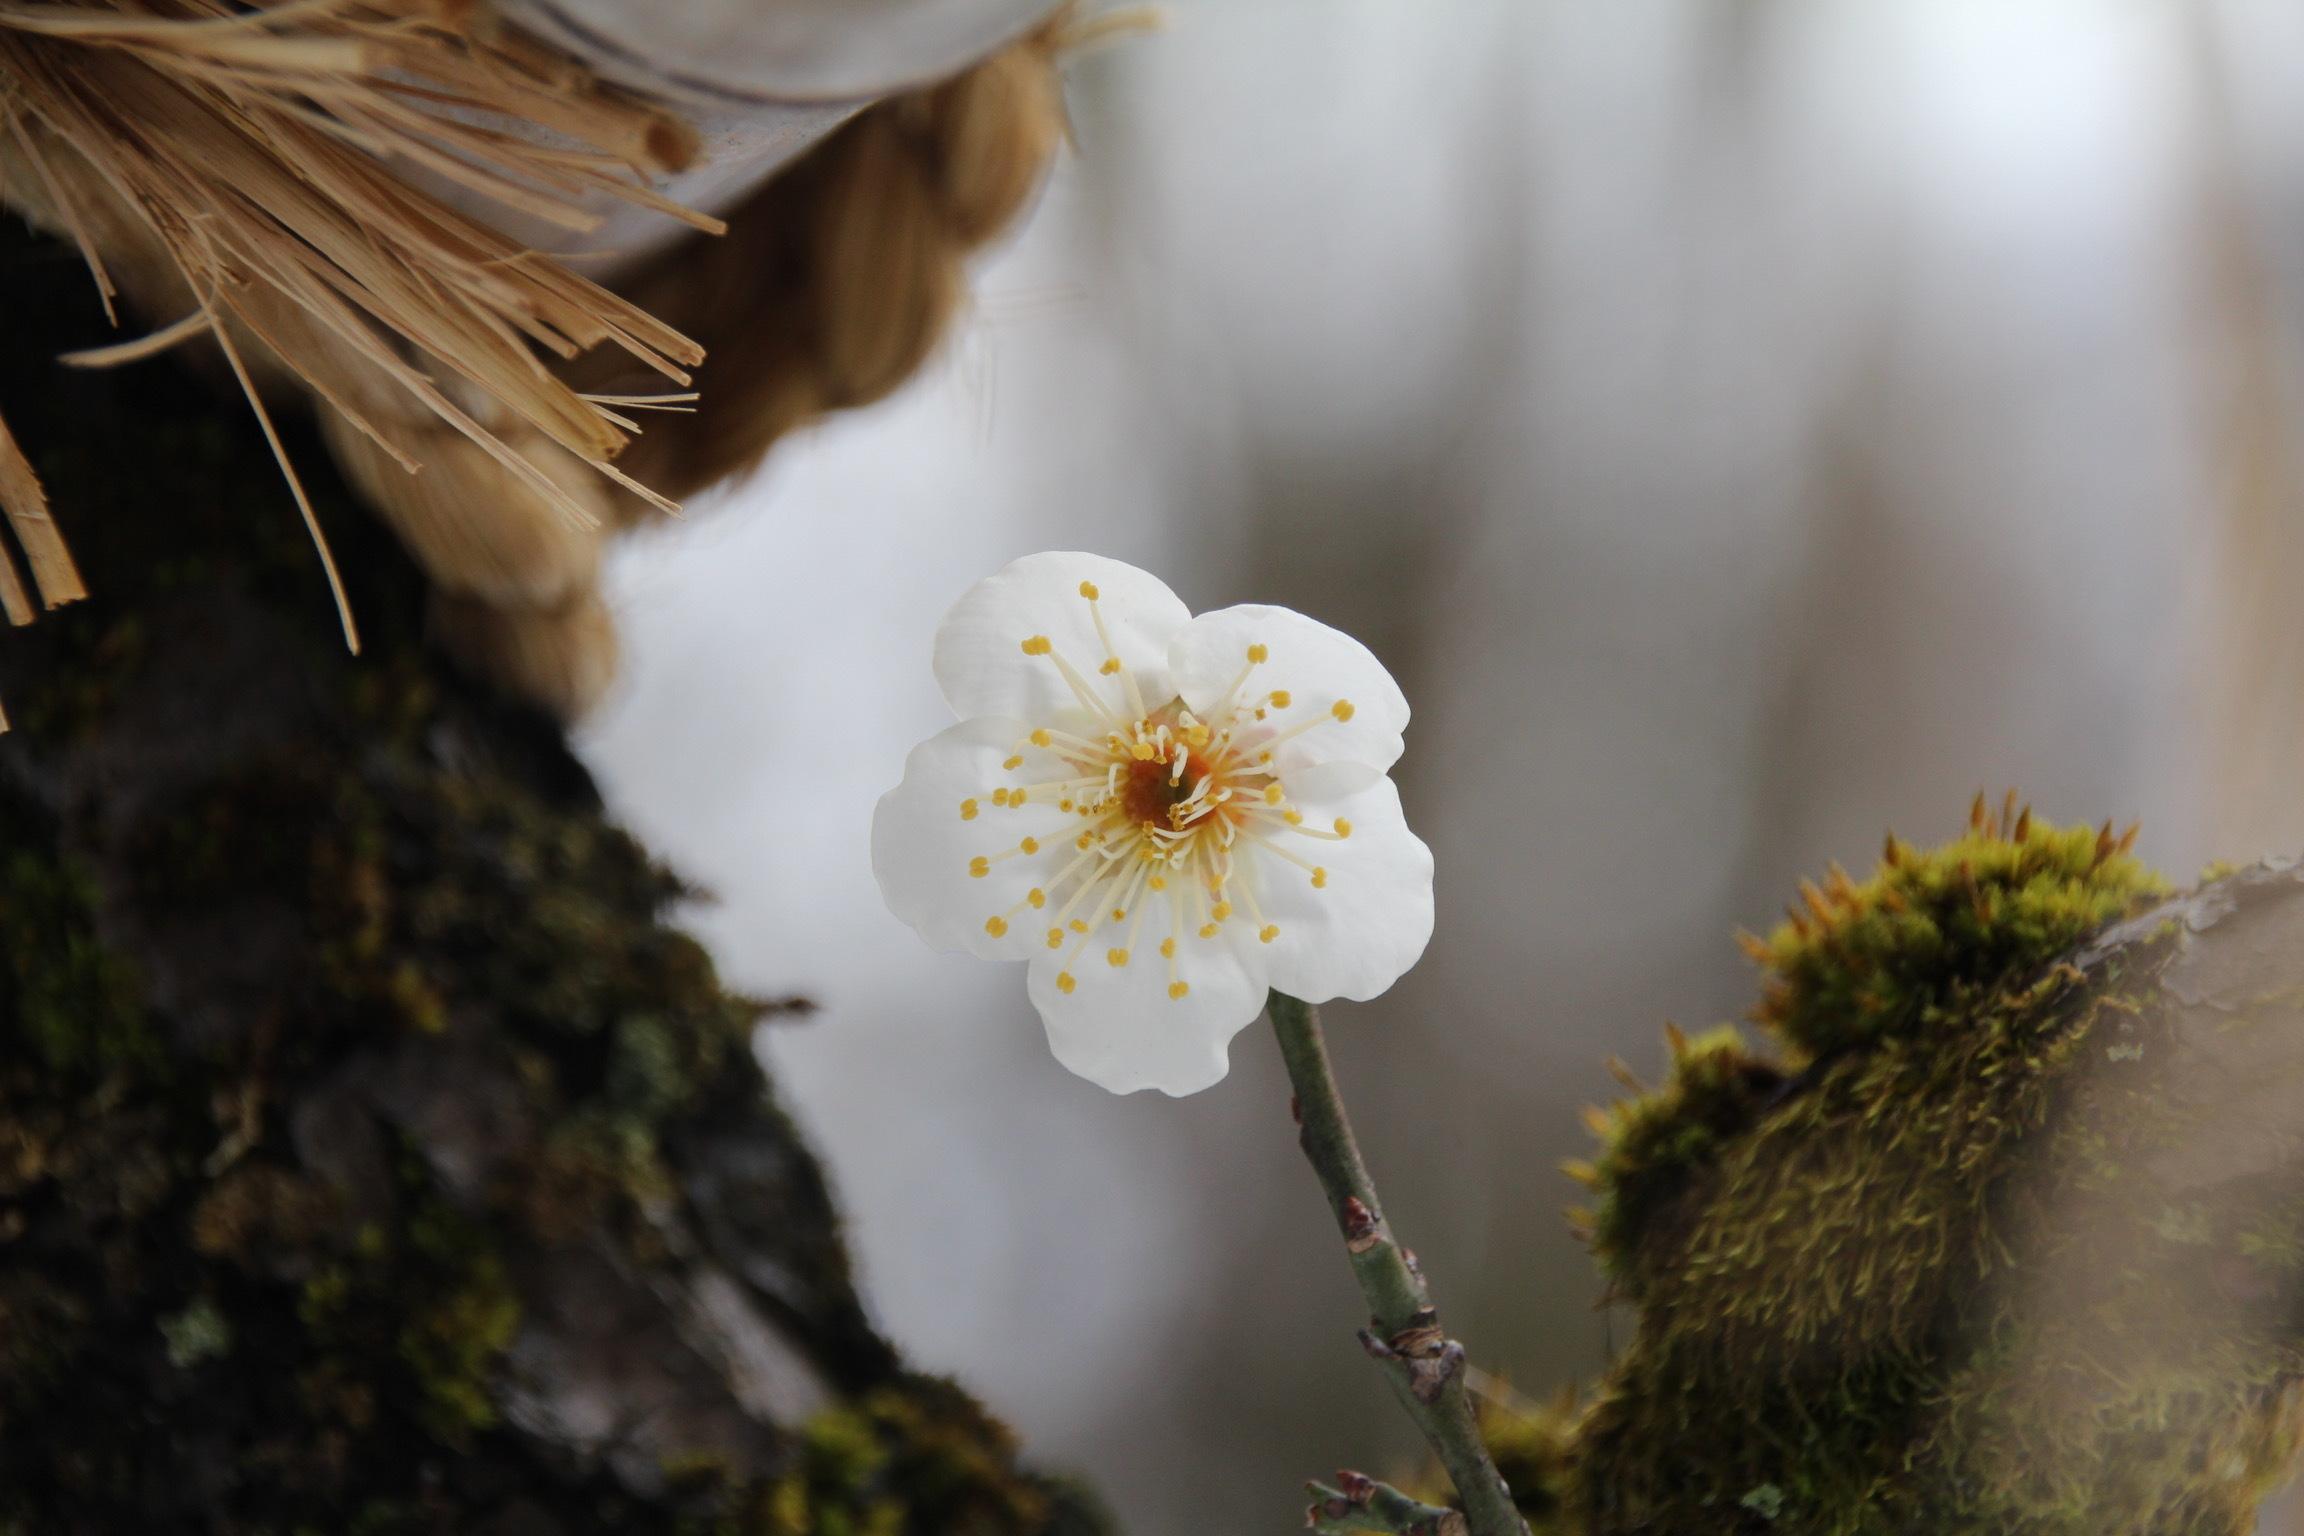 高岡古城公園の梅_b0132338_15425484.jpeg